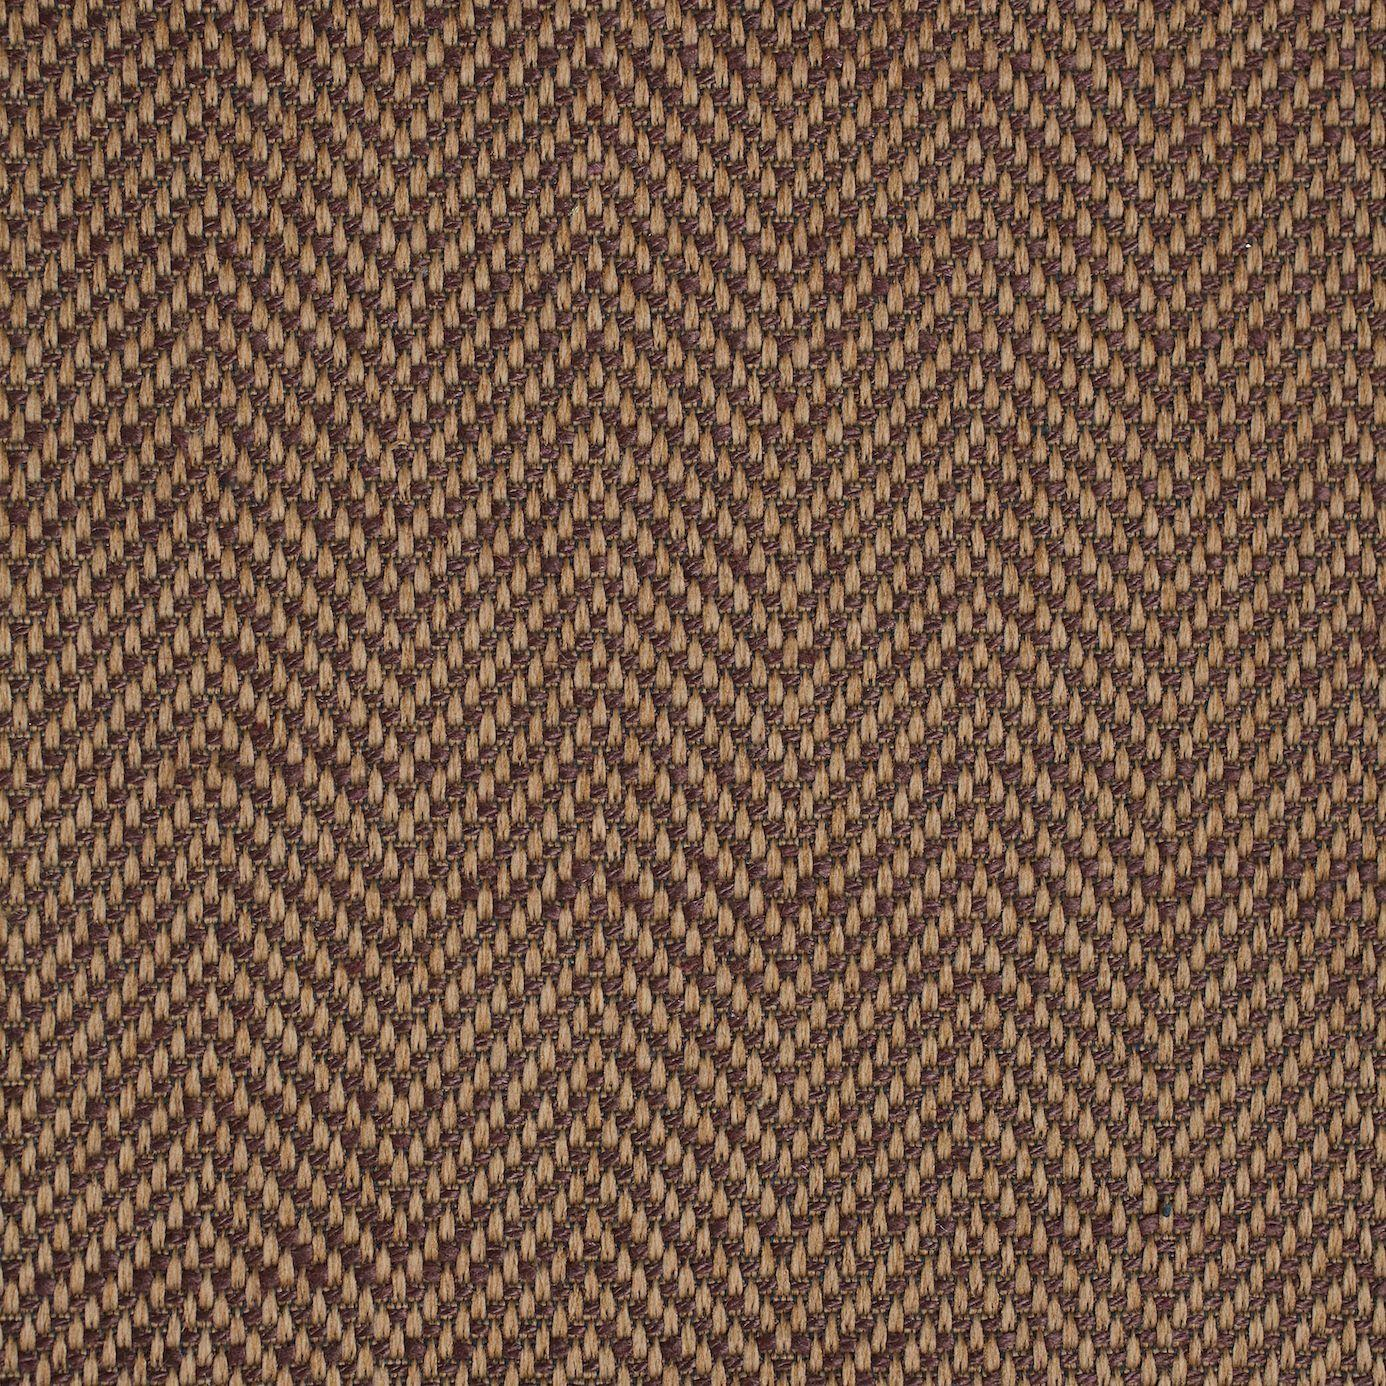 Sadiki Fabric TanLight Brown 1611 Harlequin Bakari  : HAR1611z from www.housedecorinteriors.co.uk size 1386 x 1386 jpeg 627kB